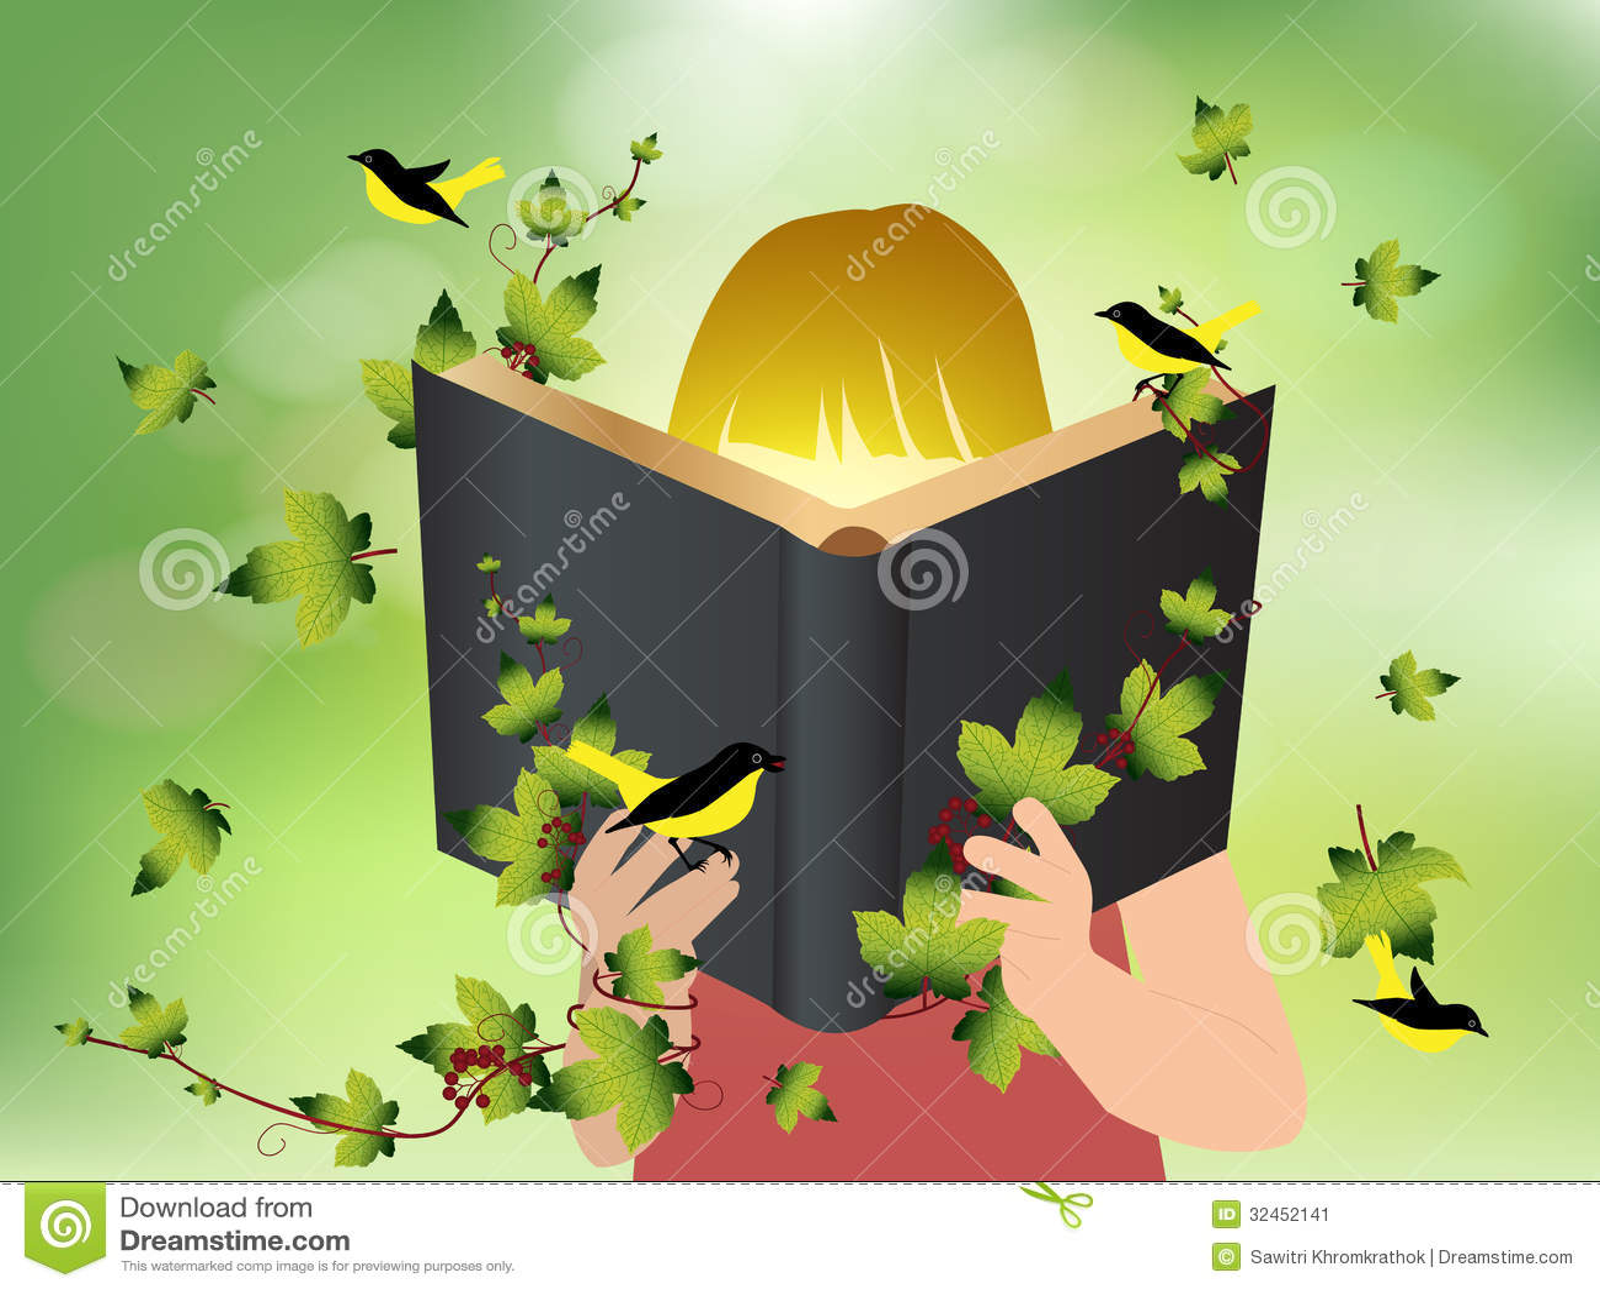 concept art books pdf download